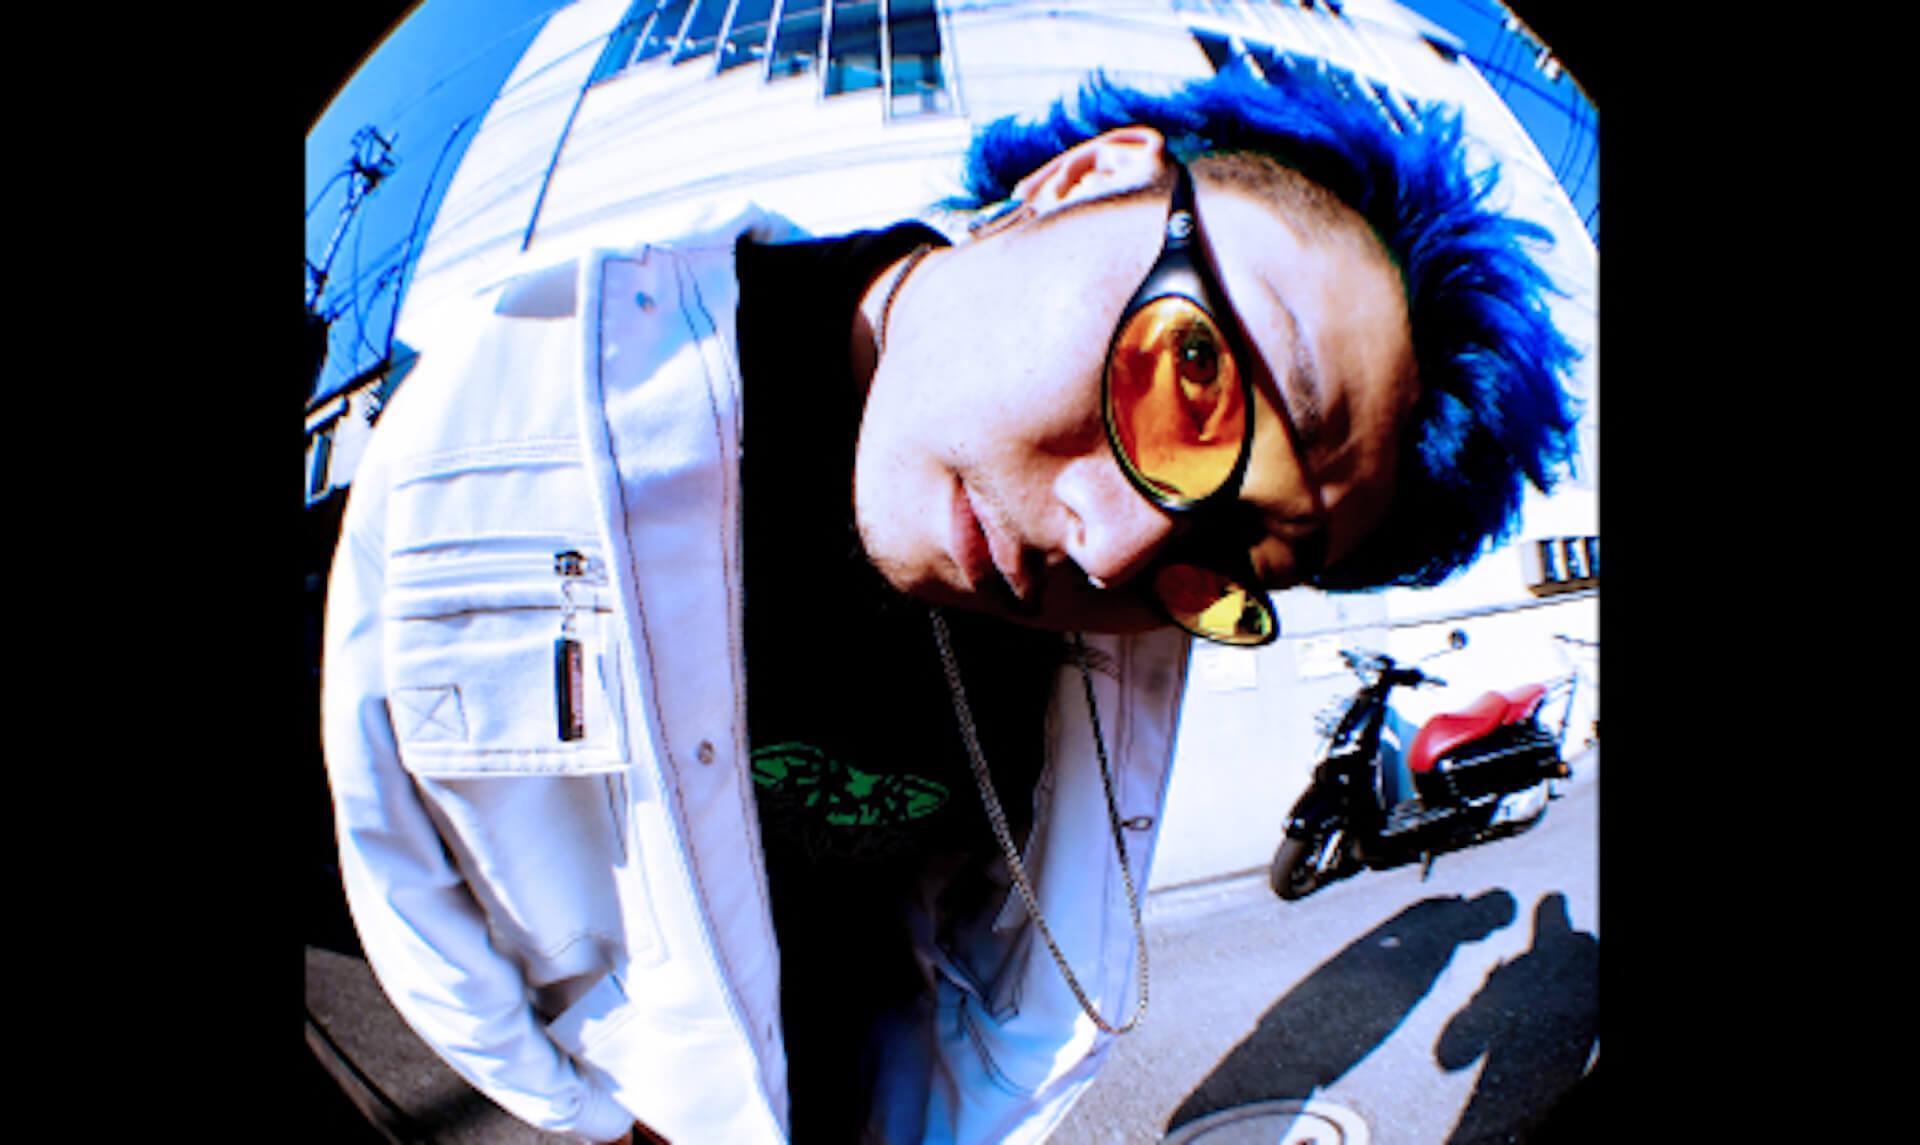 (sic)boyとKMのコラボアルバム『CHAOS TAPE』リリースパーティーが開催決定!ゲストにvividboooy、JUBEE、オカモトレイジら music20121_chaostape_releaseparty_4